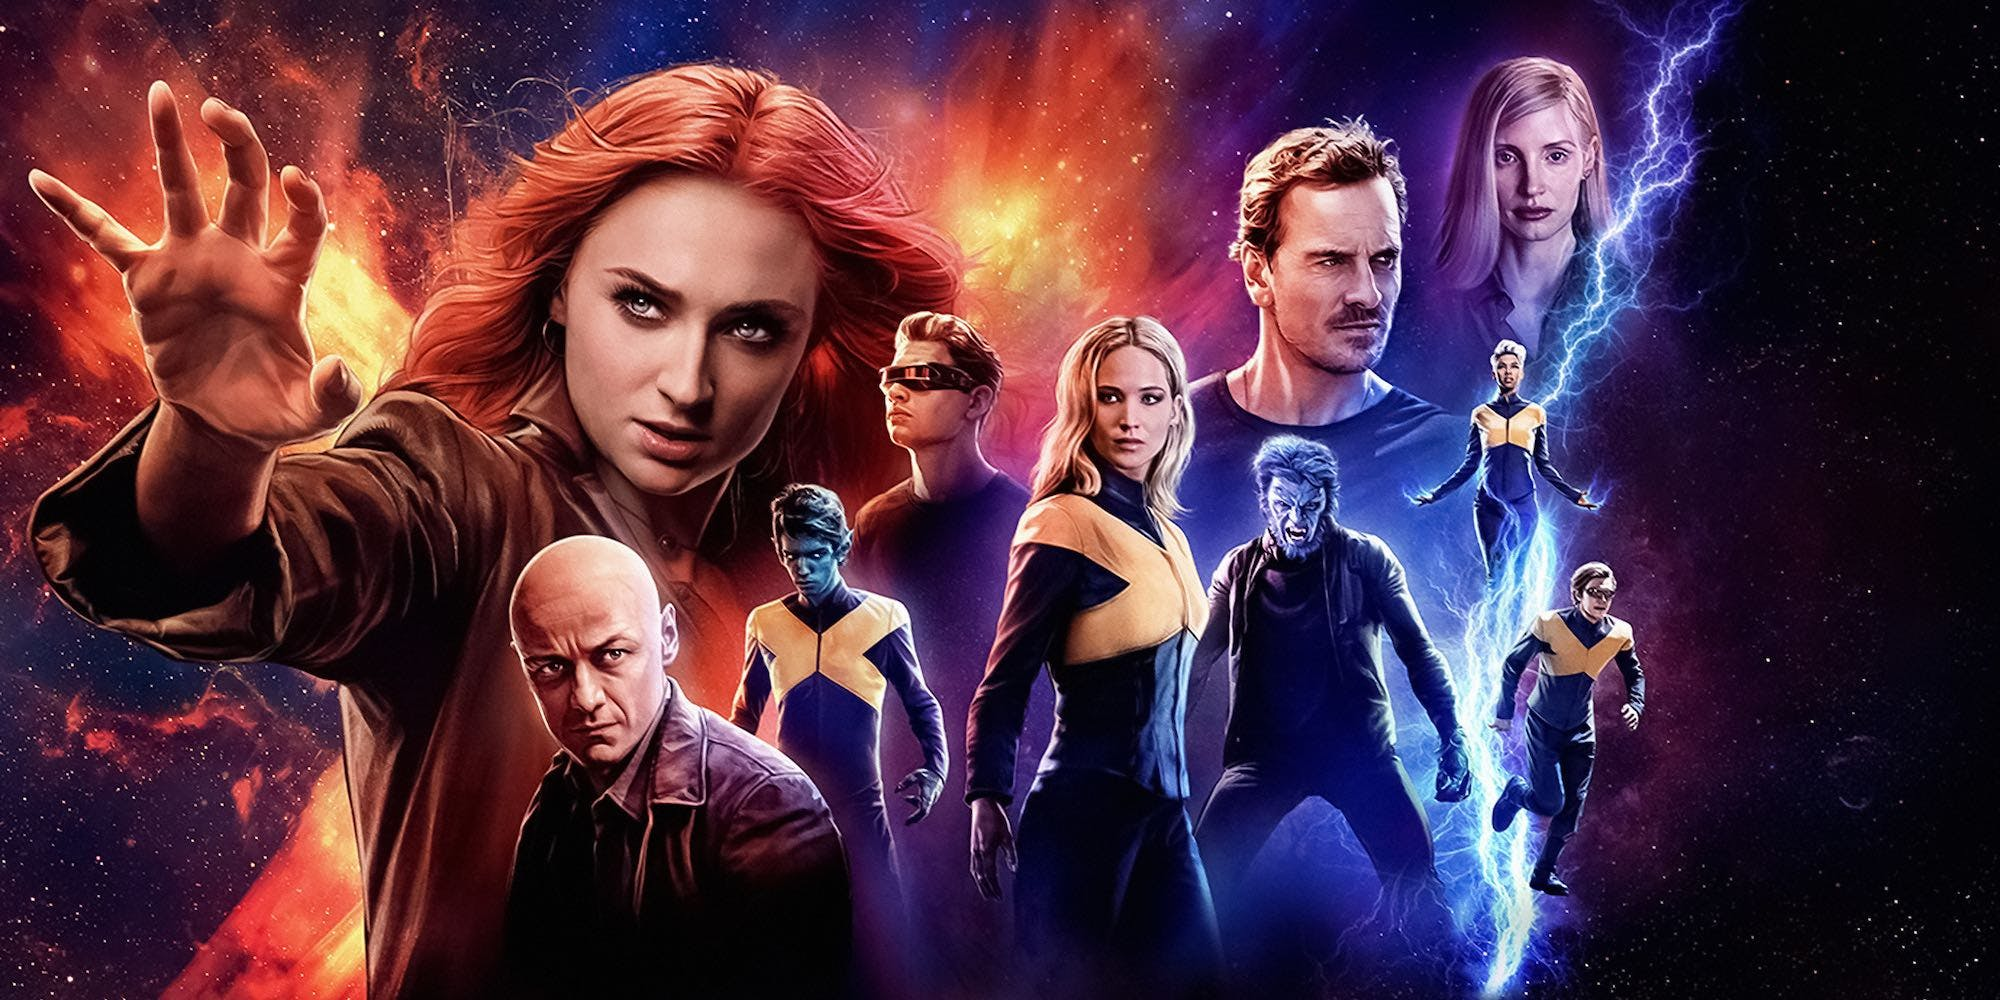 X-Men-Dark-Phoenix-Movie-Review.jpg